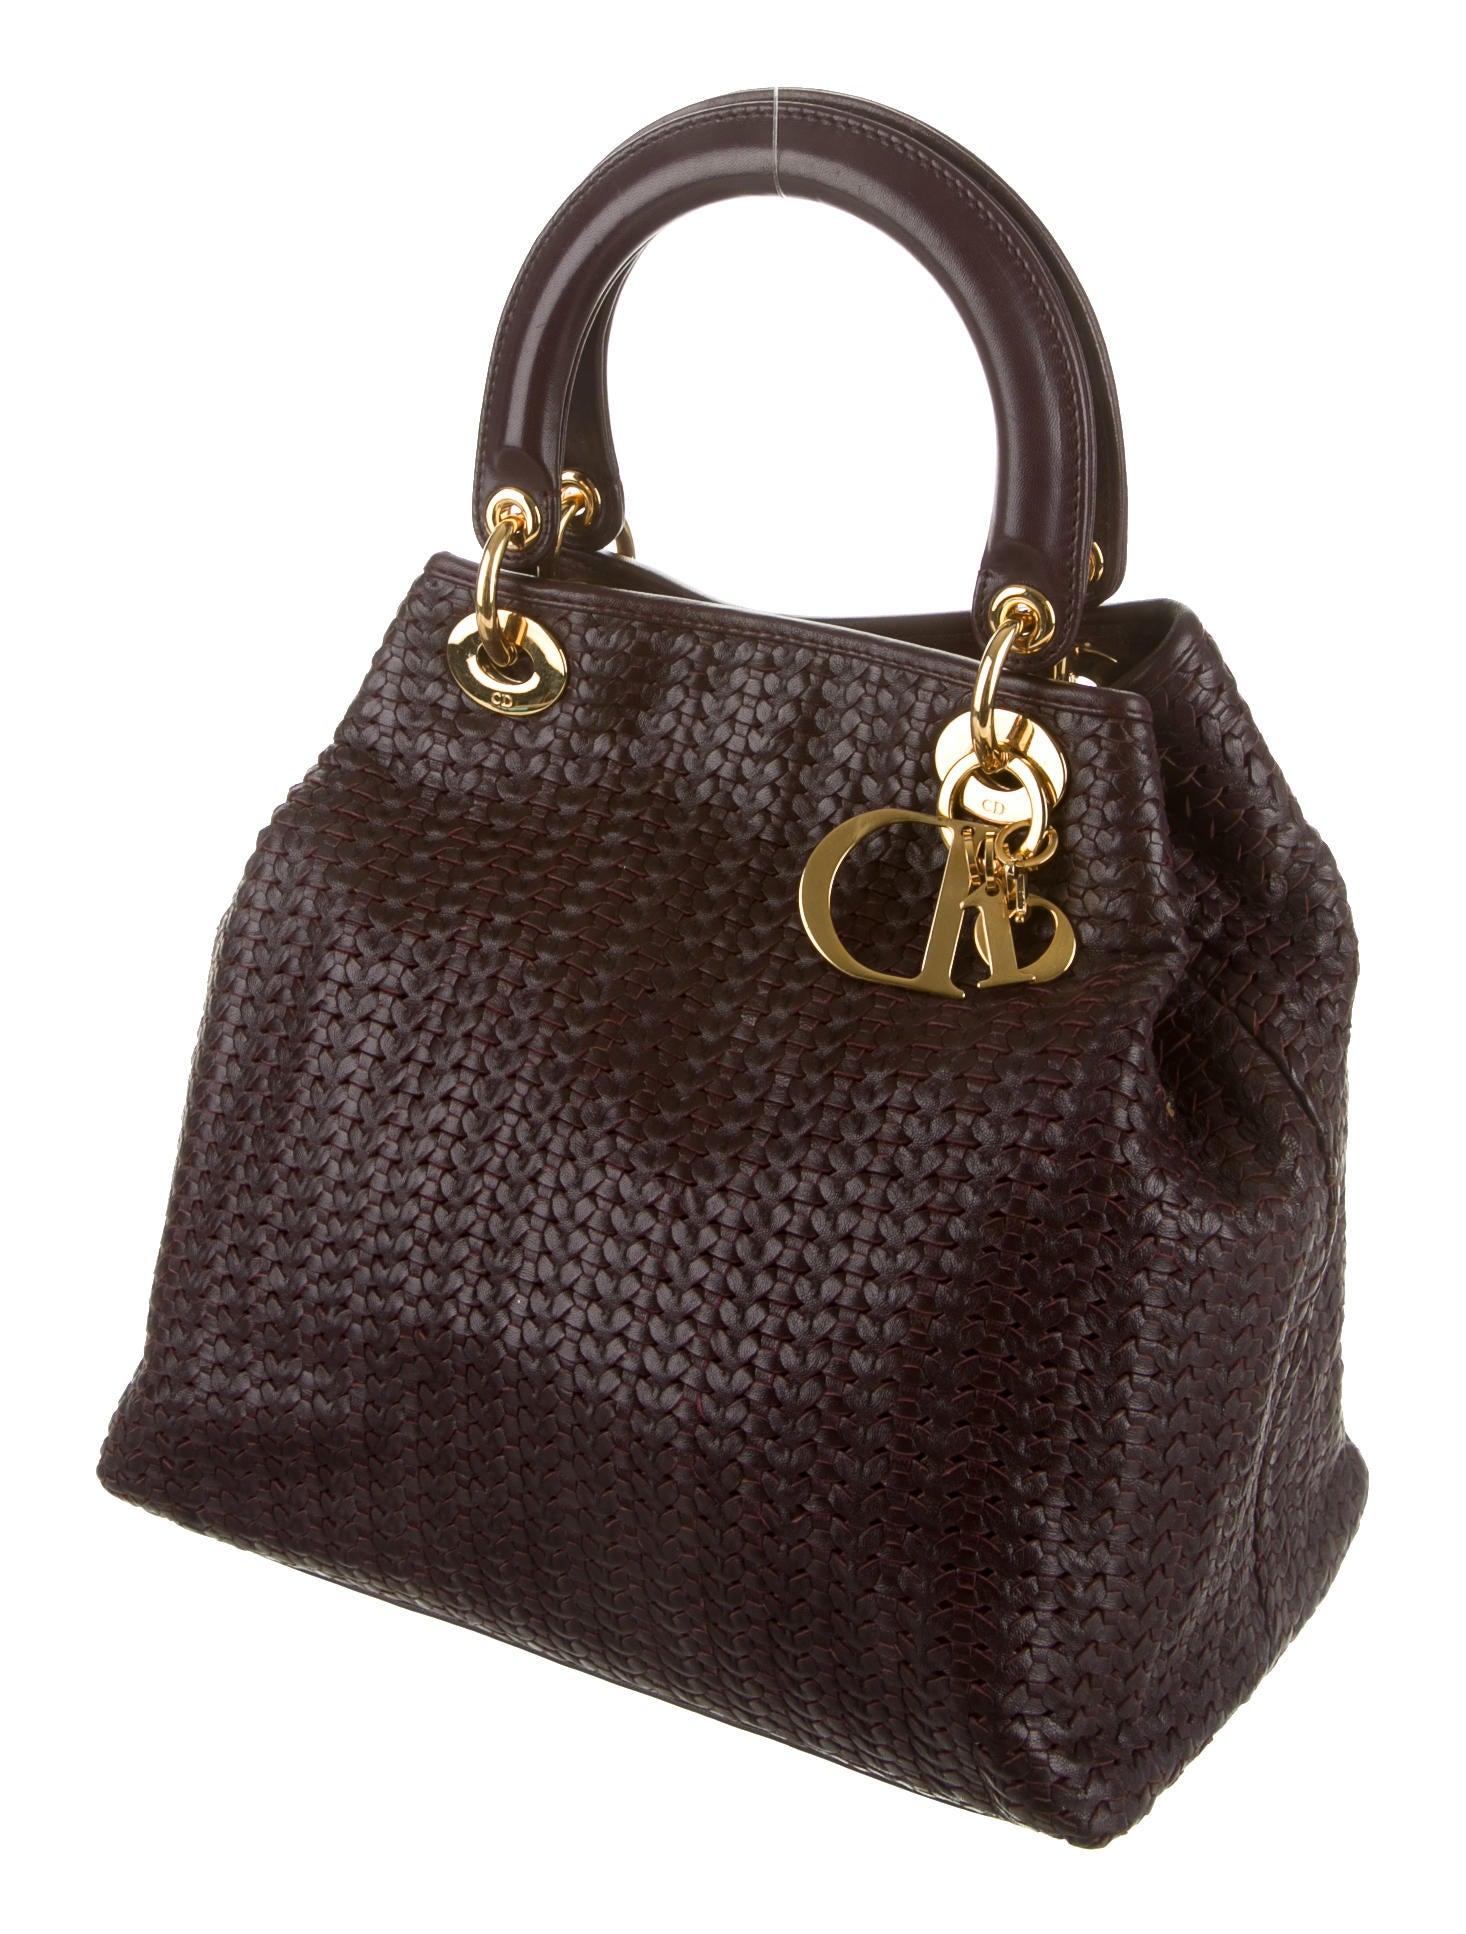 Christian Dior Lady Dior Soft Tote - Handbags - CHR31932 ...